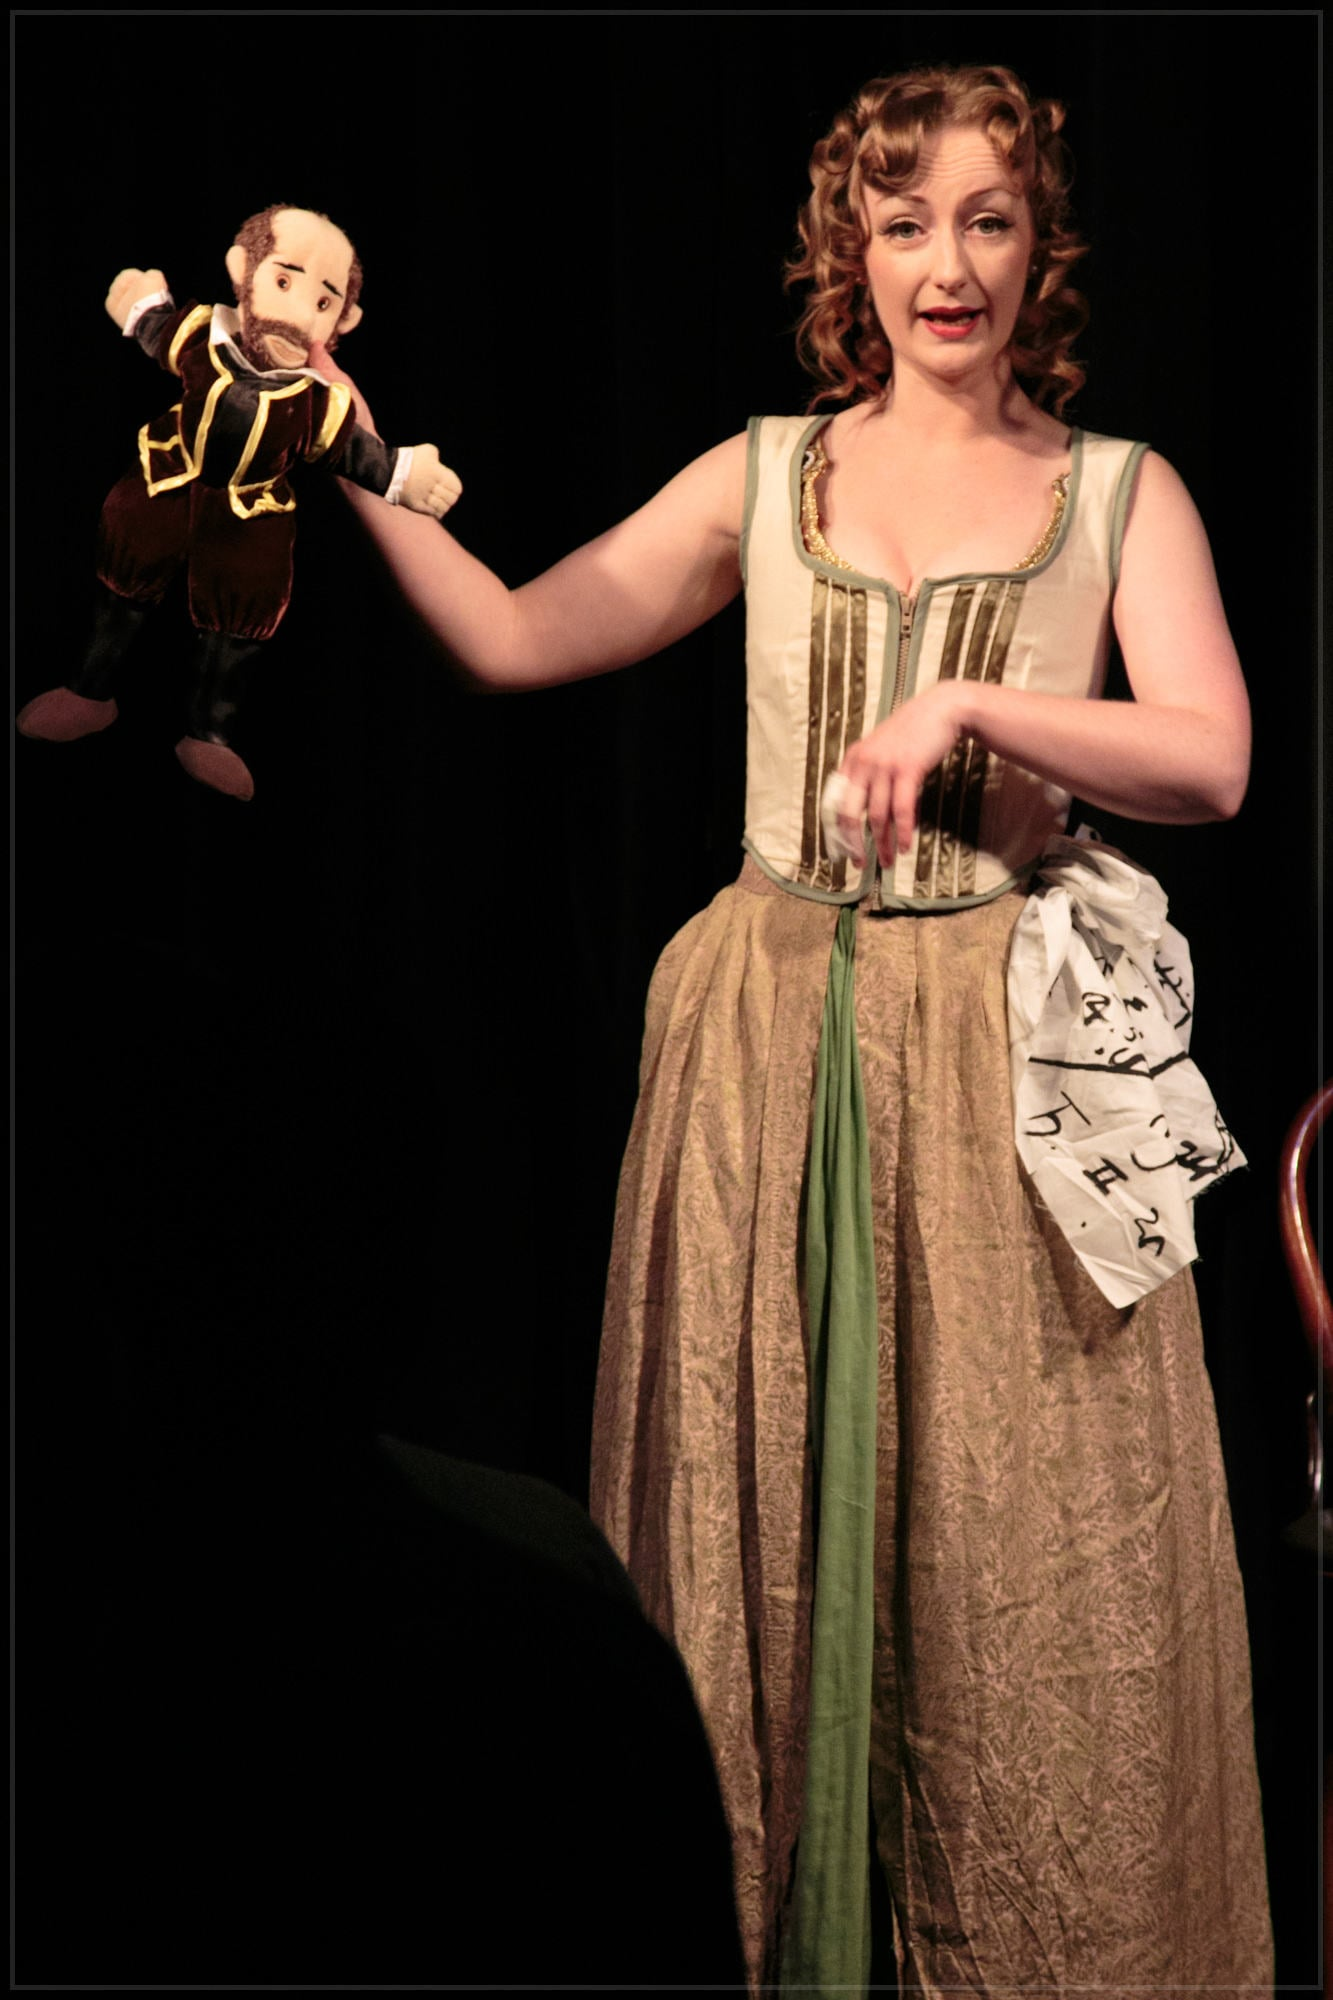 Ginger Blush - Nell Gwynn's History Laid Bare 019.jpg